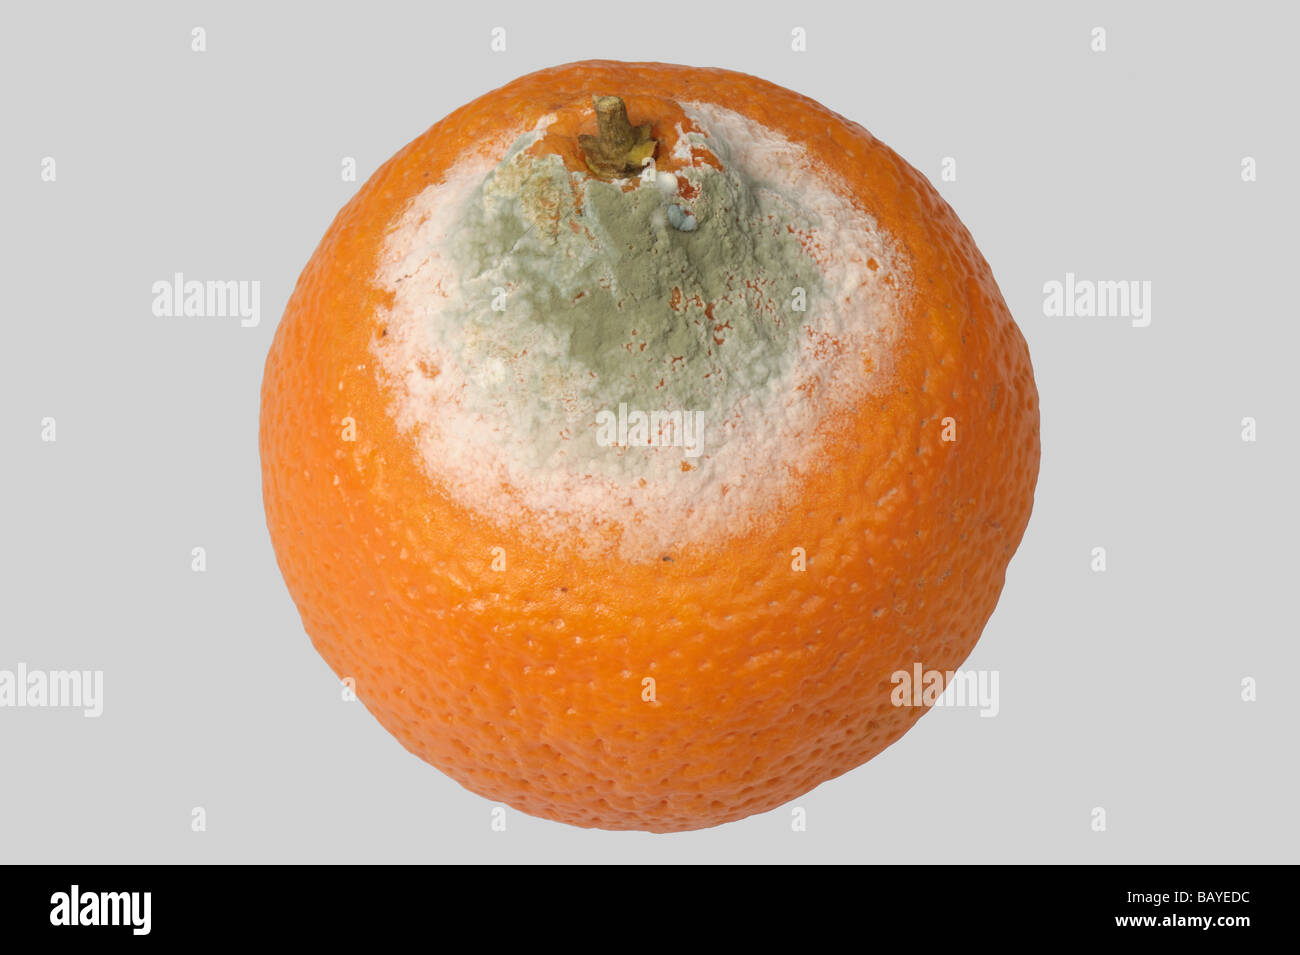 Green mould Penicillium digitatum storage fruit rot on an orange - Stock Image